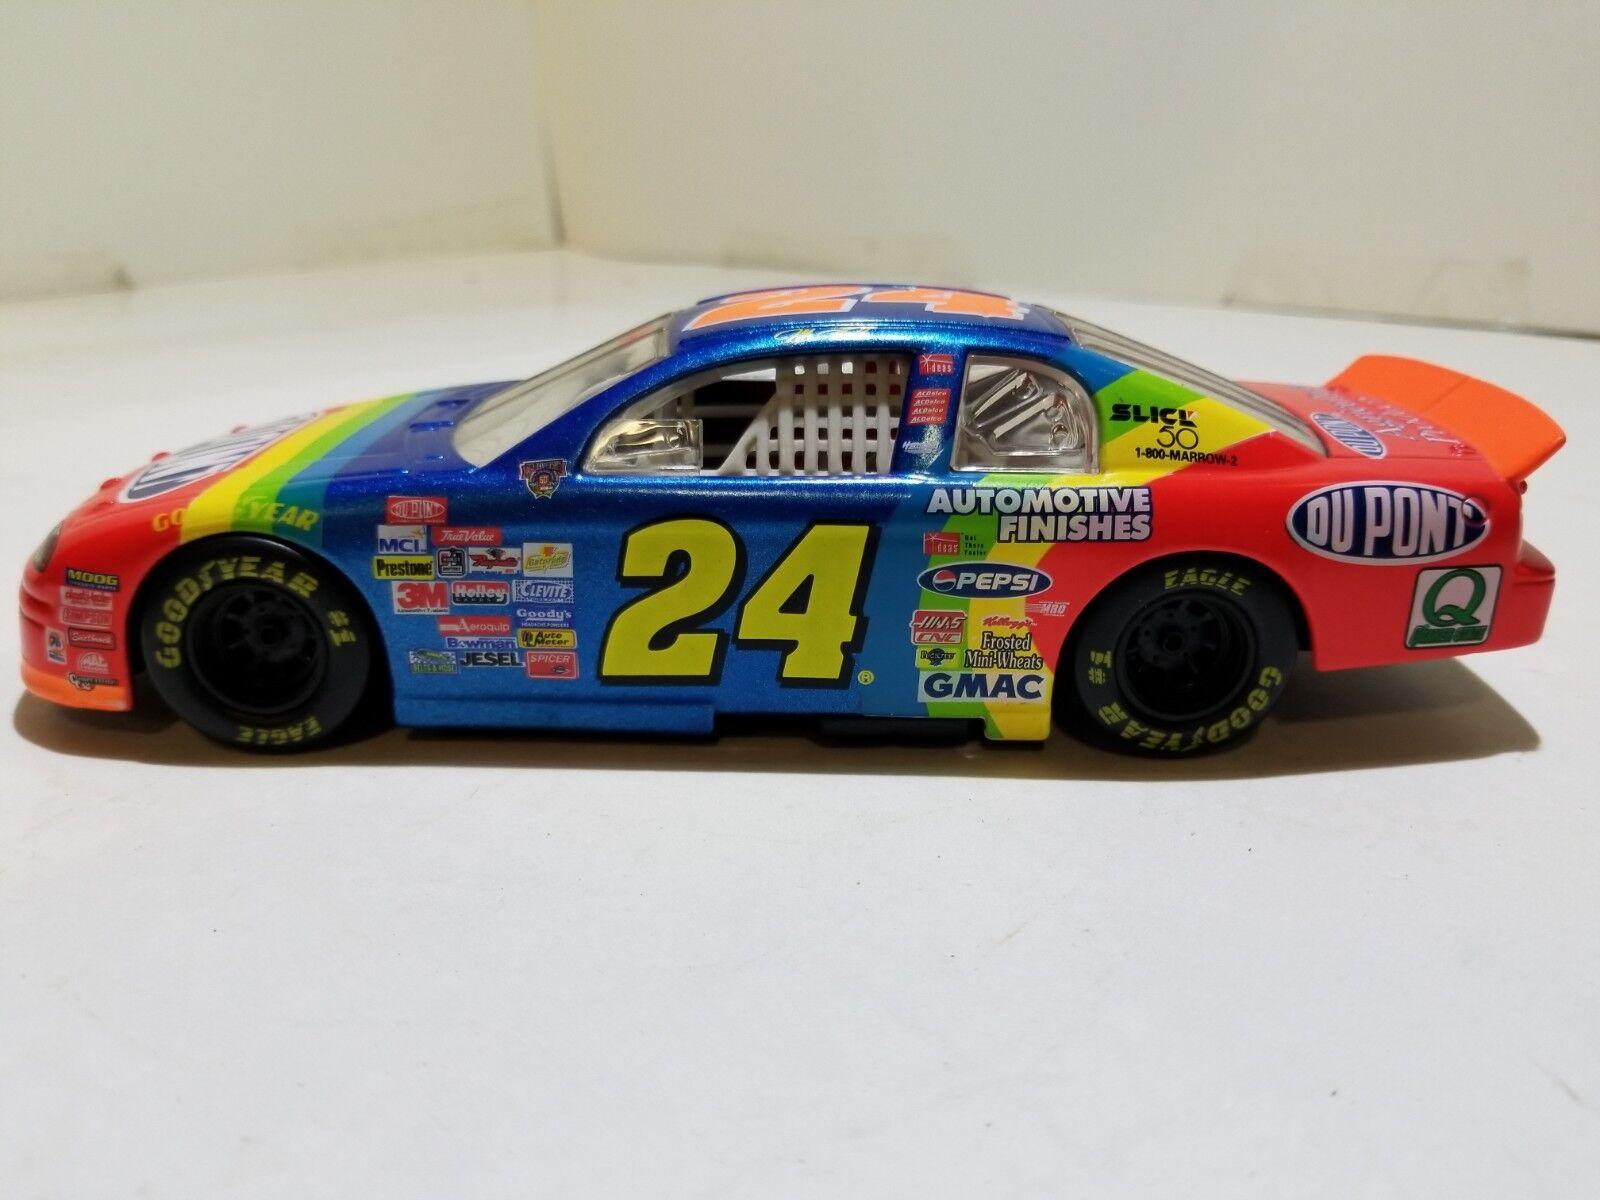 NASCAR 1 24 Jeff Gordon 1998 Monte Carlo Du Pont Racecar